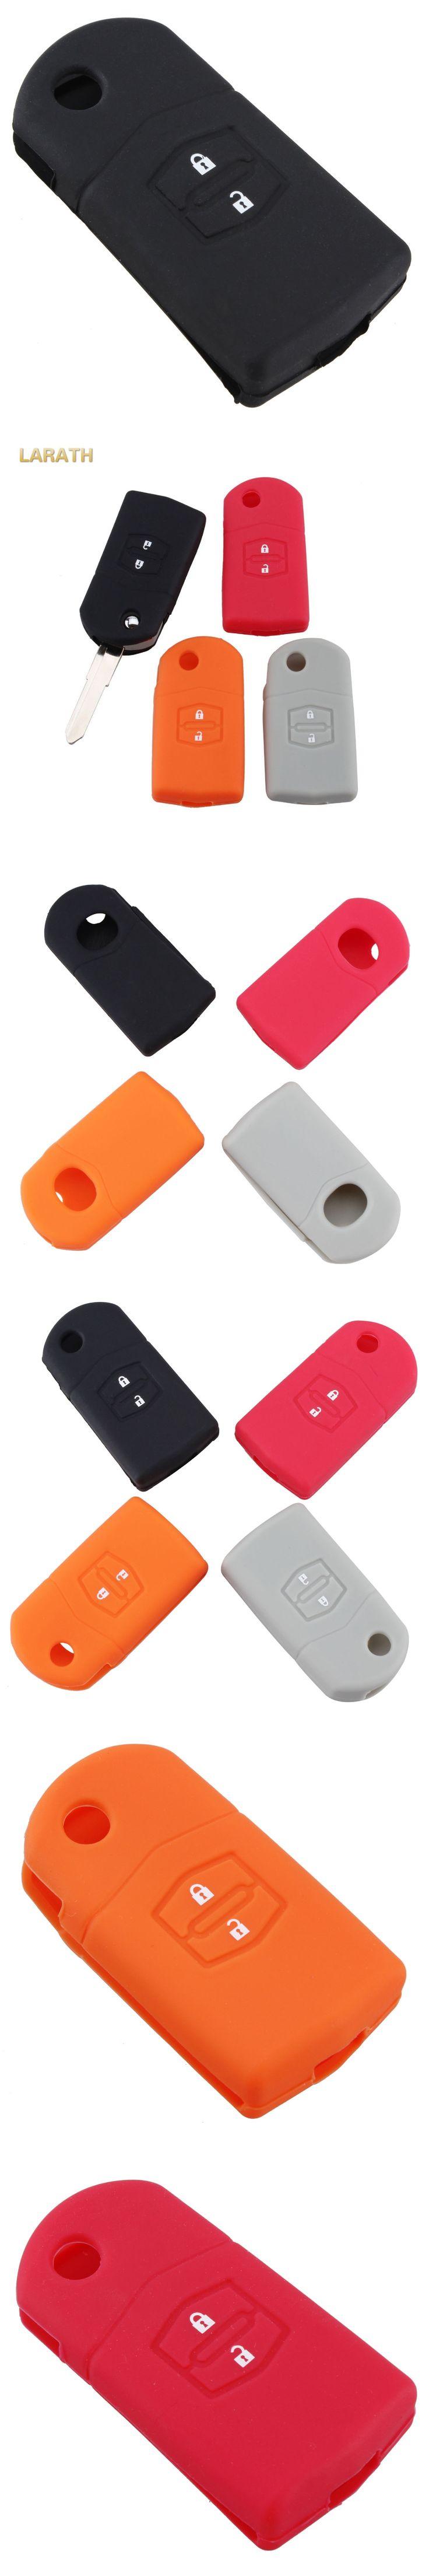 LARATH Silicone Case Remote Key Covers for Mazda 2 3 5 6 M5 CX7 CX9 RX 2 Buttons Car Flip Key Protective Case